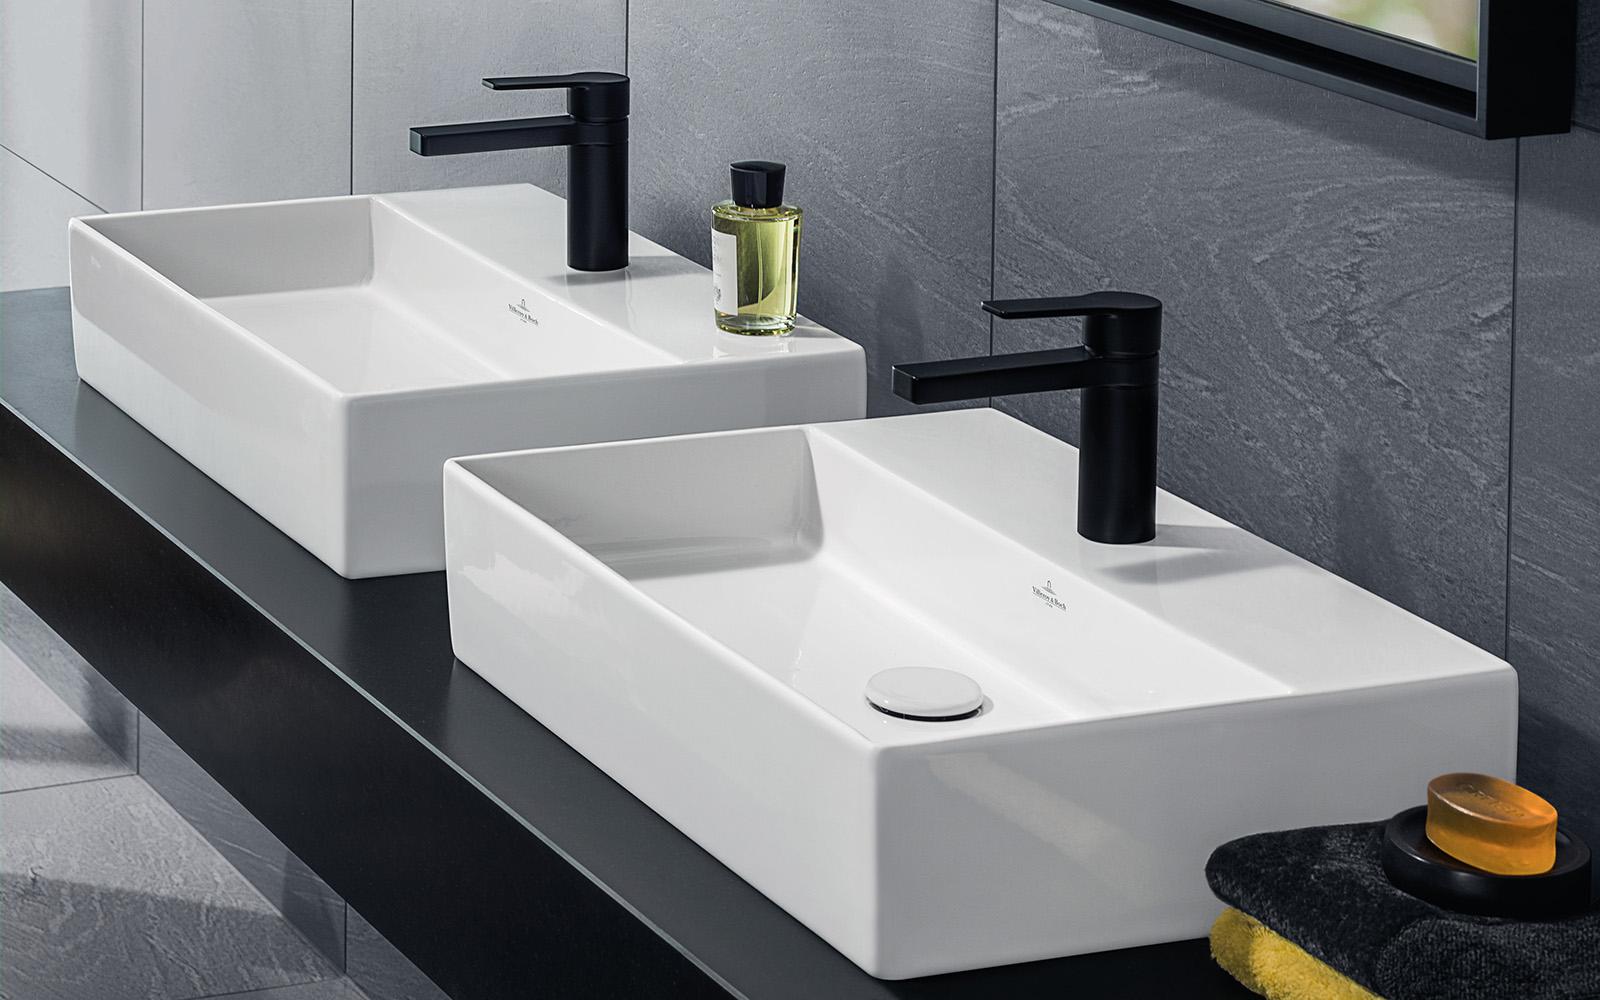 Villeroy & Boch, Memento collectie, badkamer collectie, badkamer trends 2018